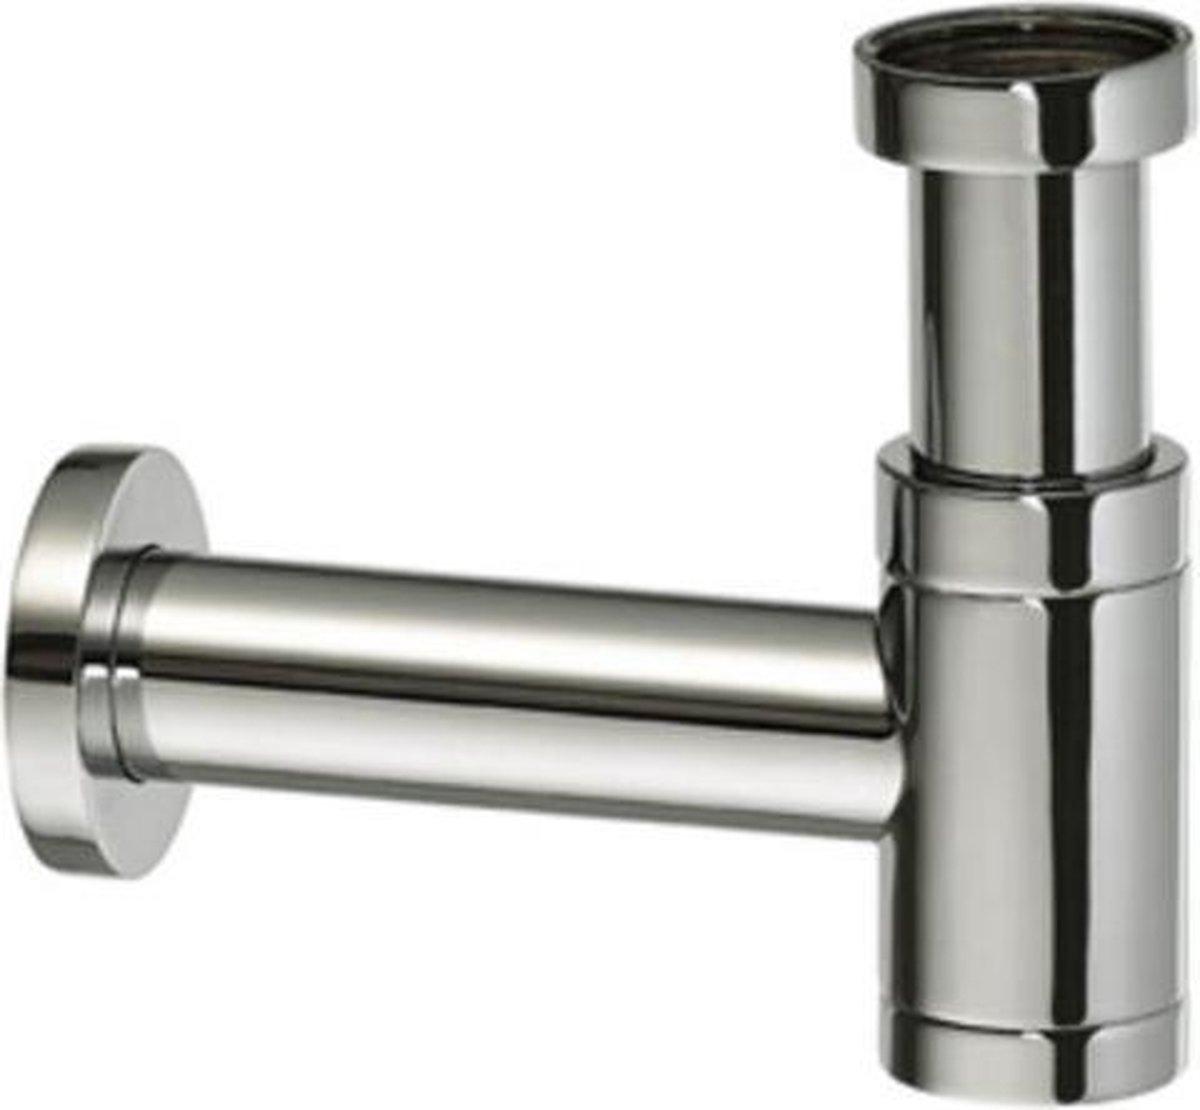 Raminex Slim designsifon voor fontein 1 1/4 x32mm RVS look